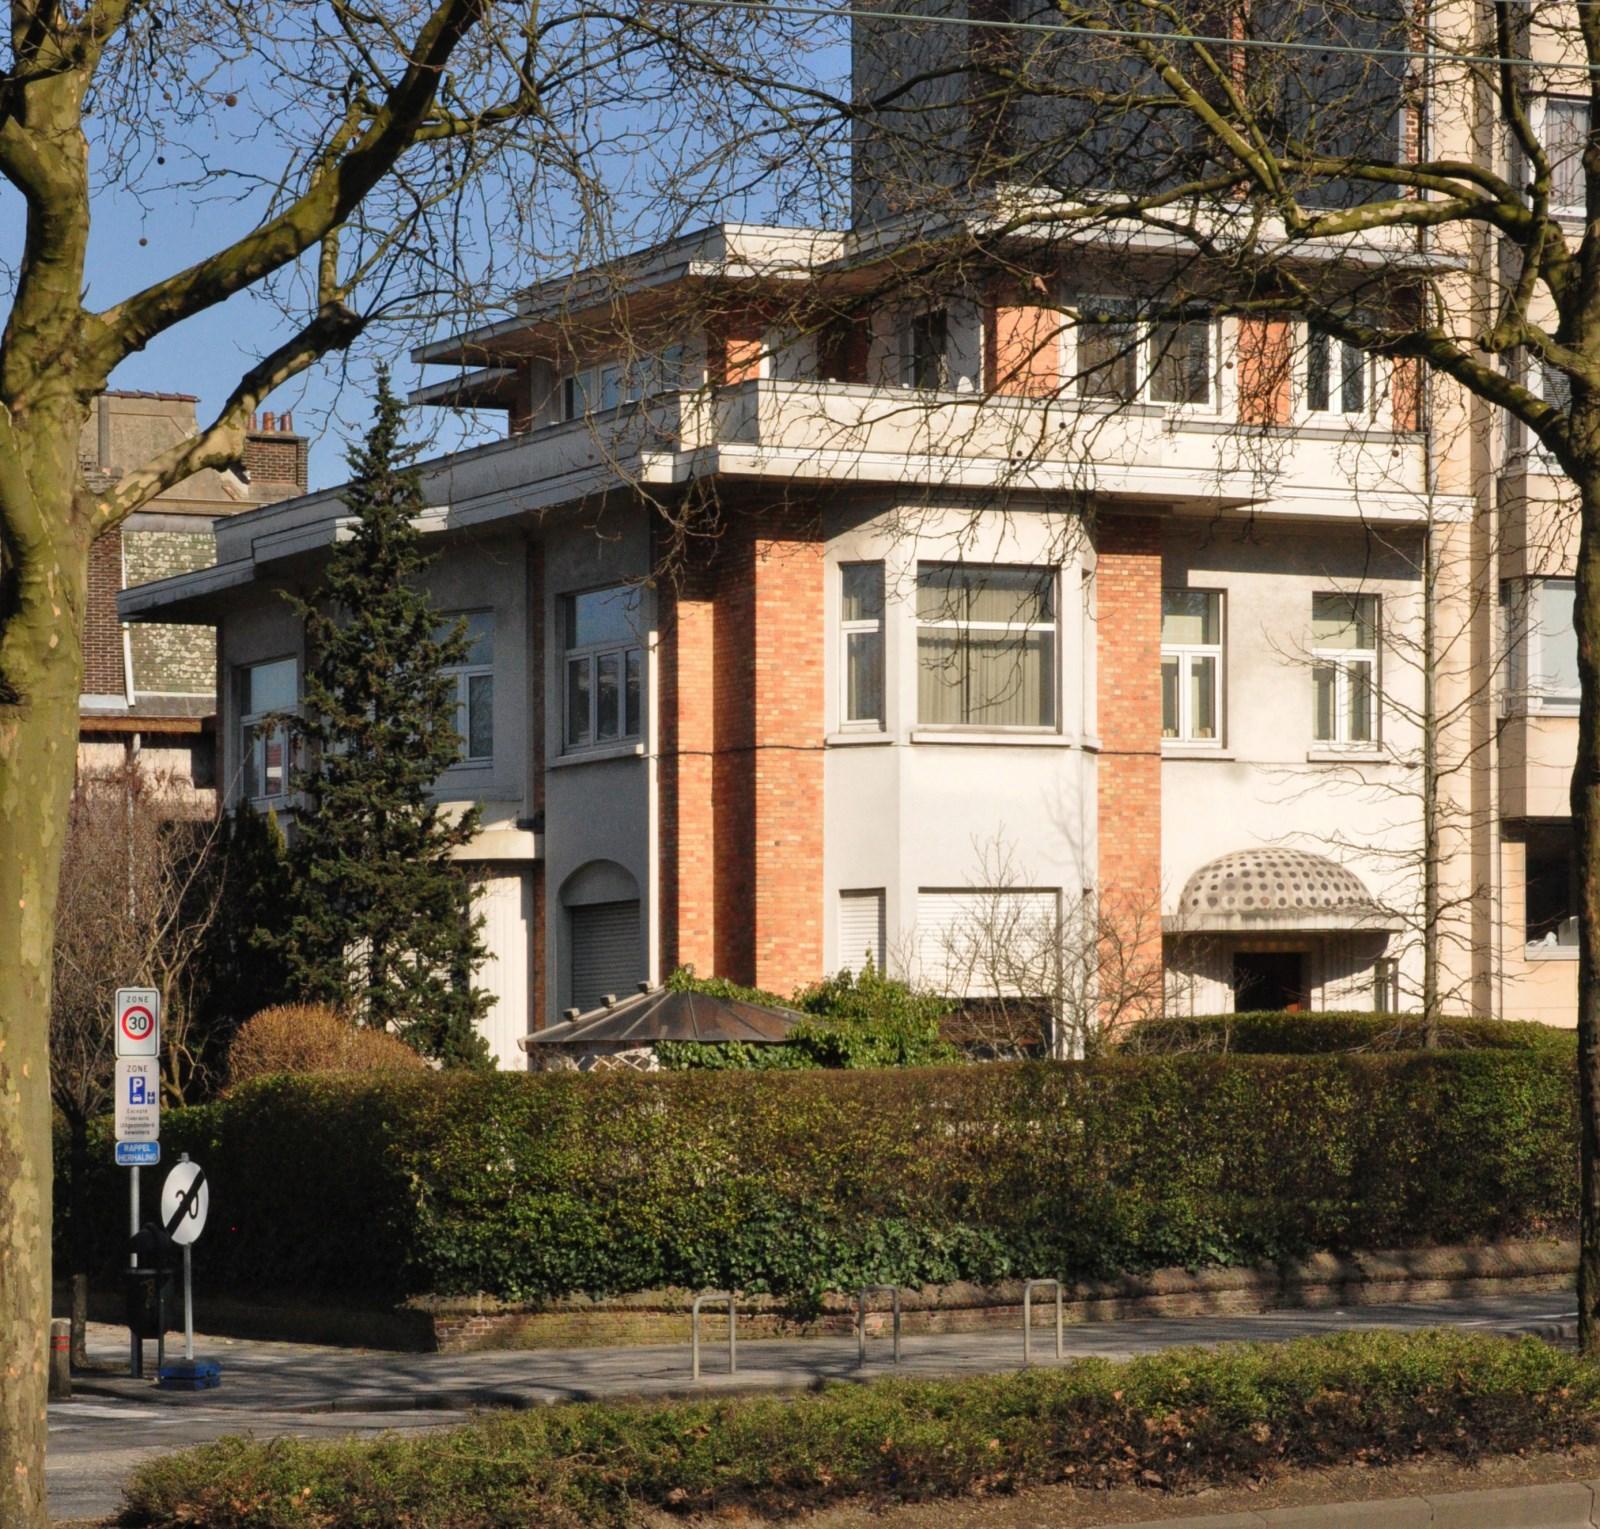 Boulevard Lambermont 428, 2013